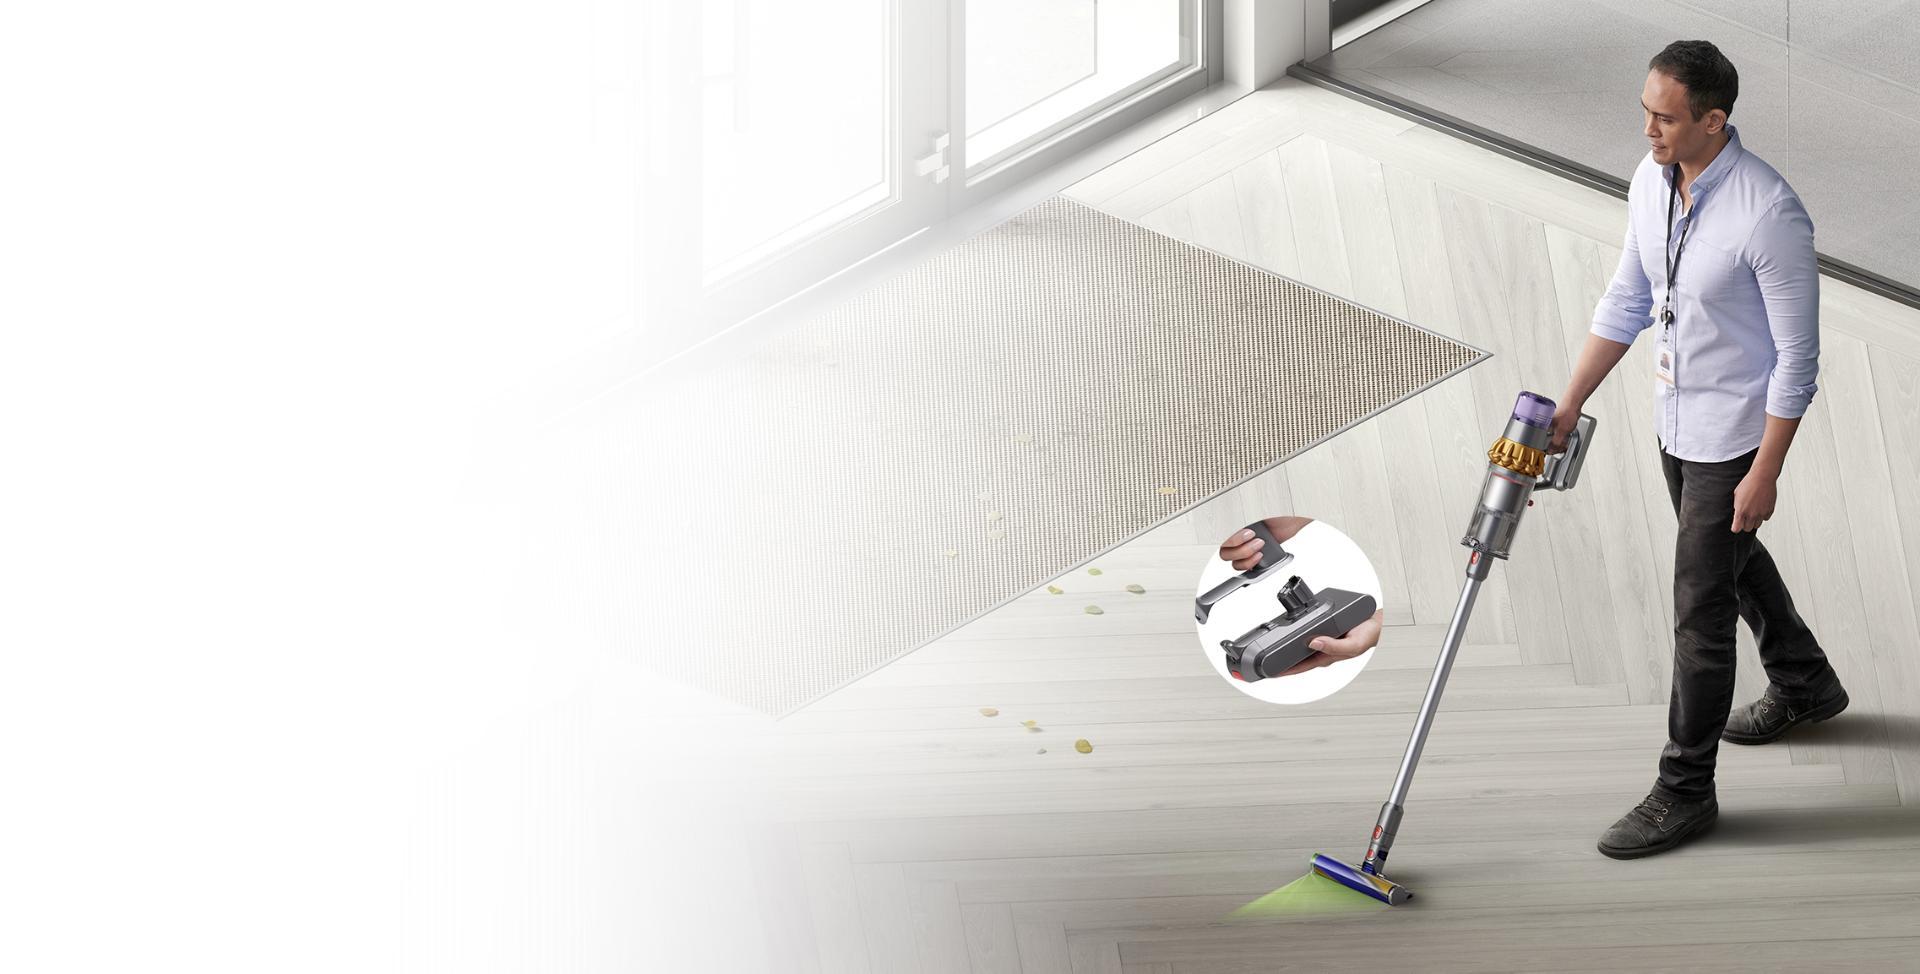 Man vacuuming hard floor with Dyson V15 Detect vacuum